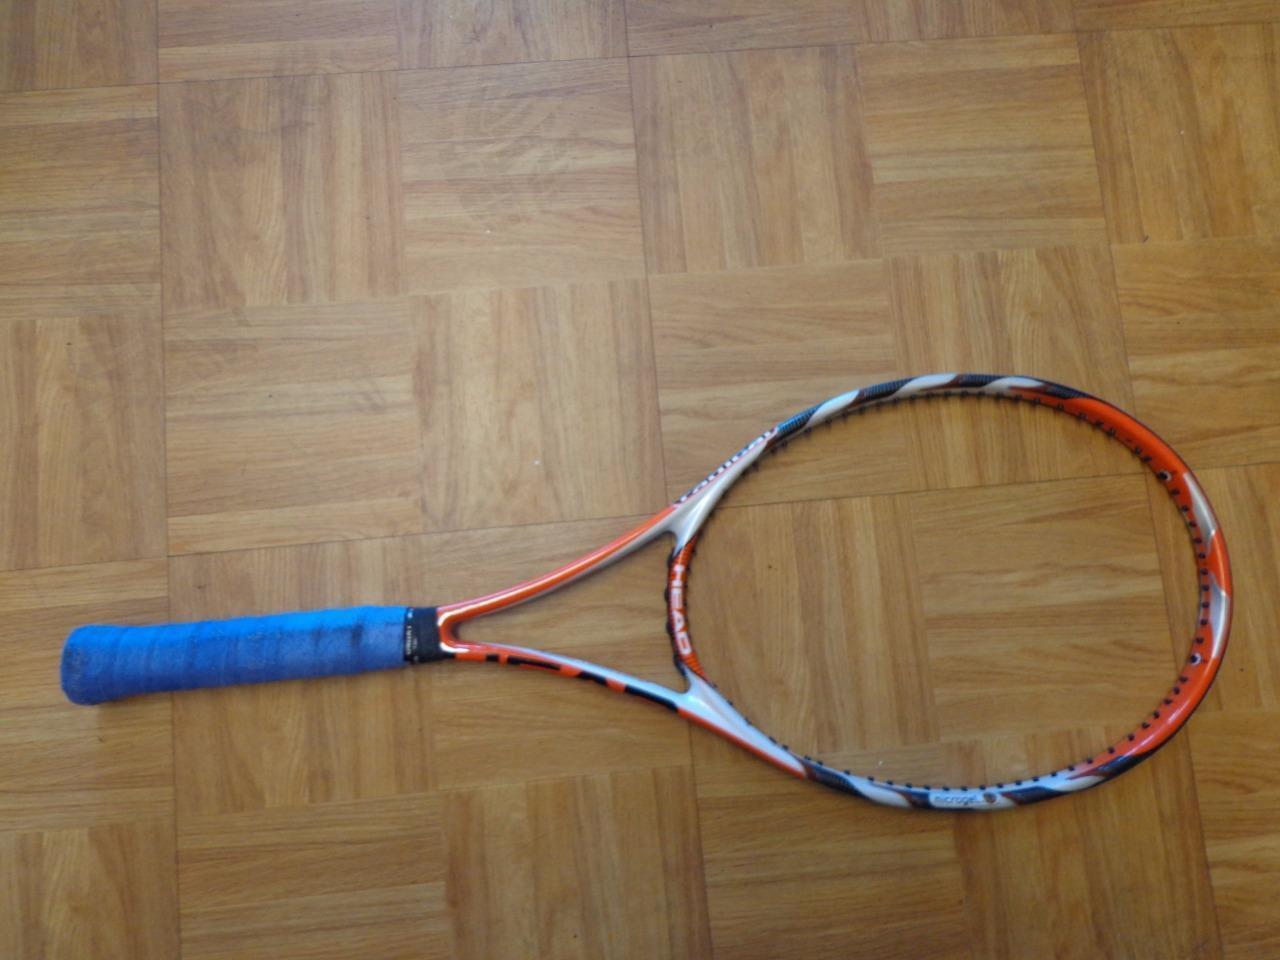 Head Microgel Radical Midplus 18x20 98 headsize 4 1 2 grip Tennis Racquet